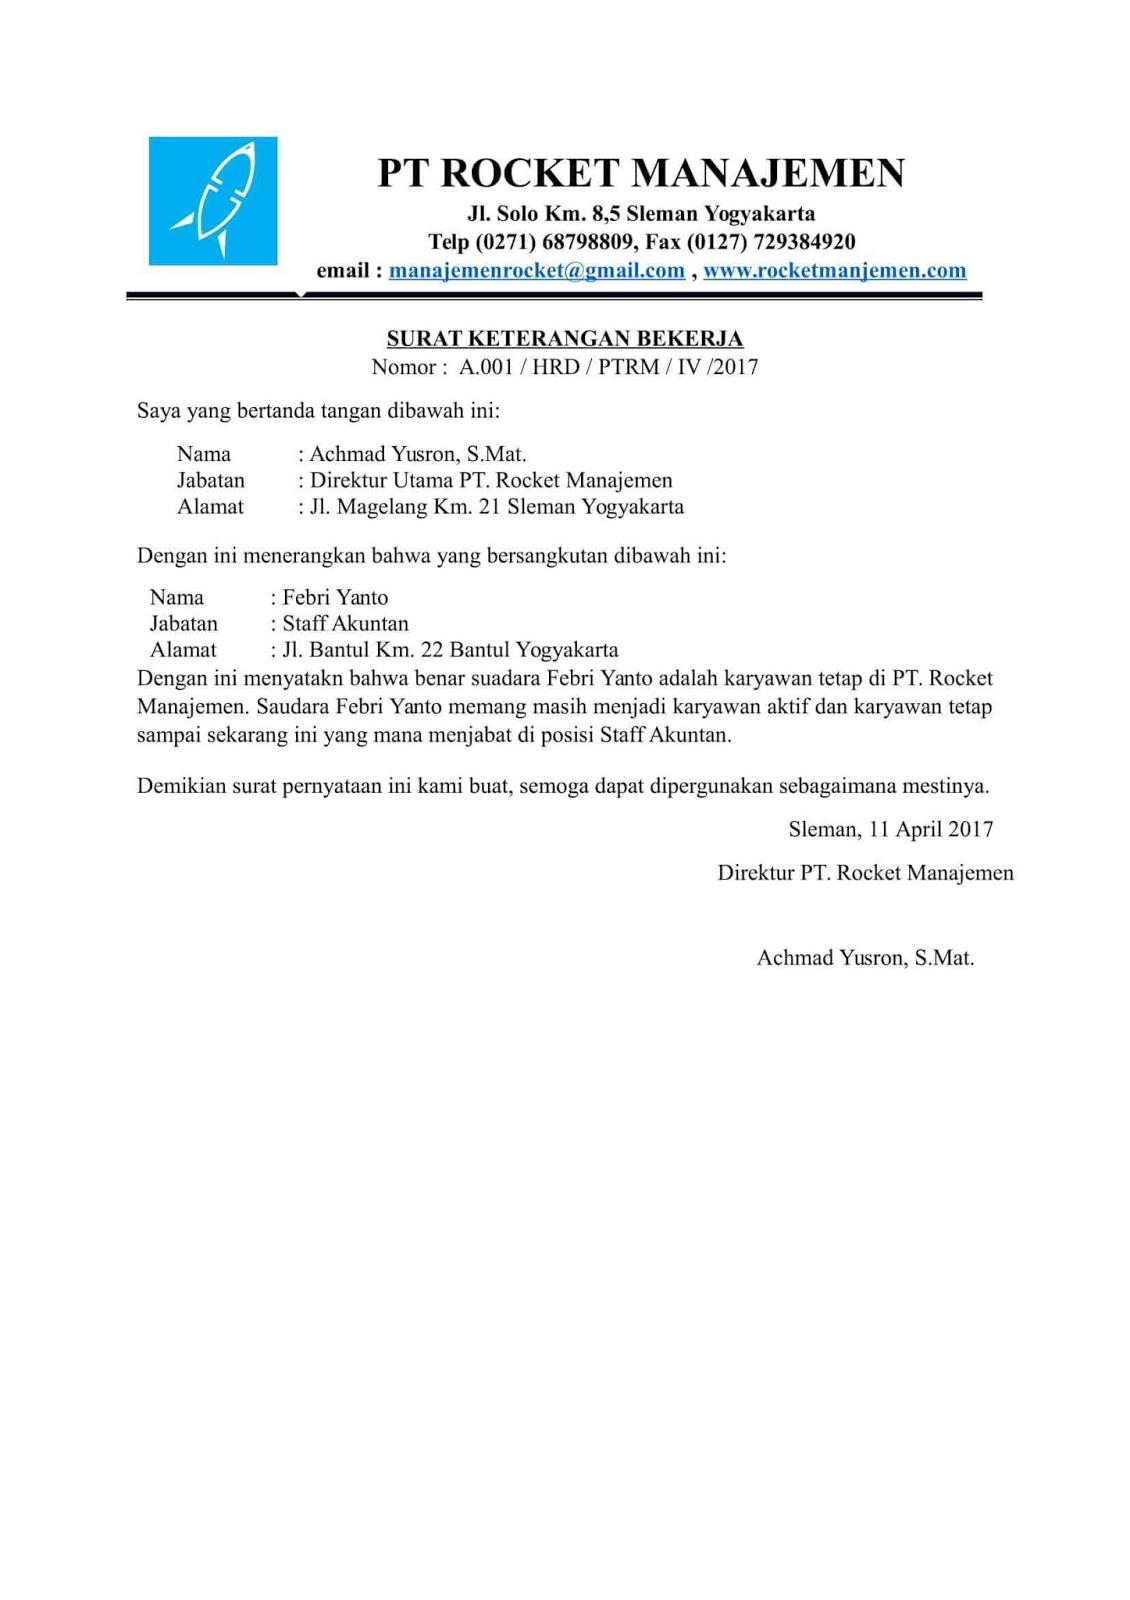 Contoh Surat Pernyataan Perusahaan